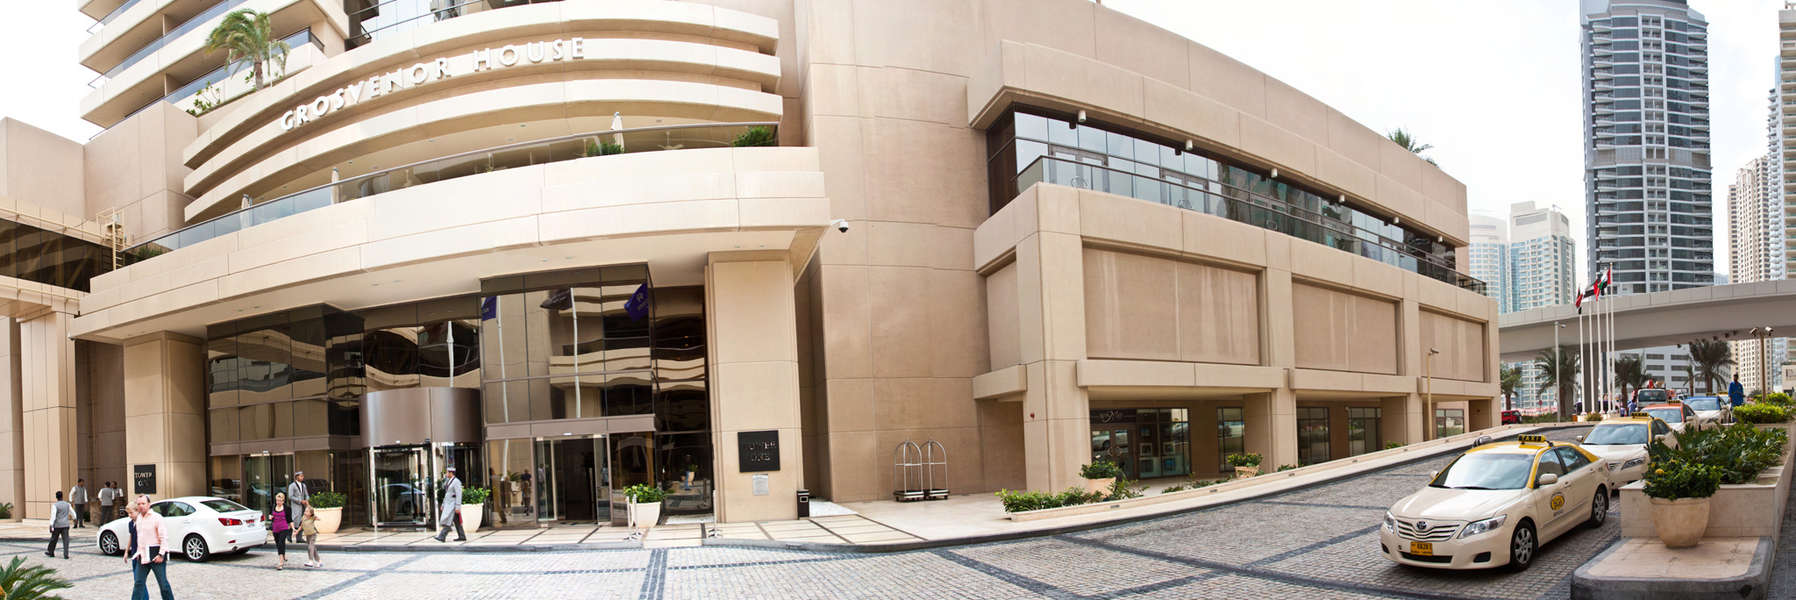 Health Avenue Grosvenor House - Dubai Marina